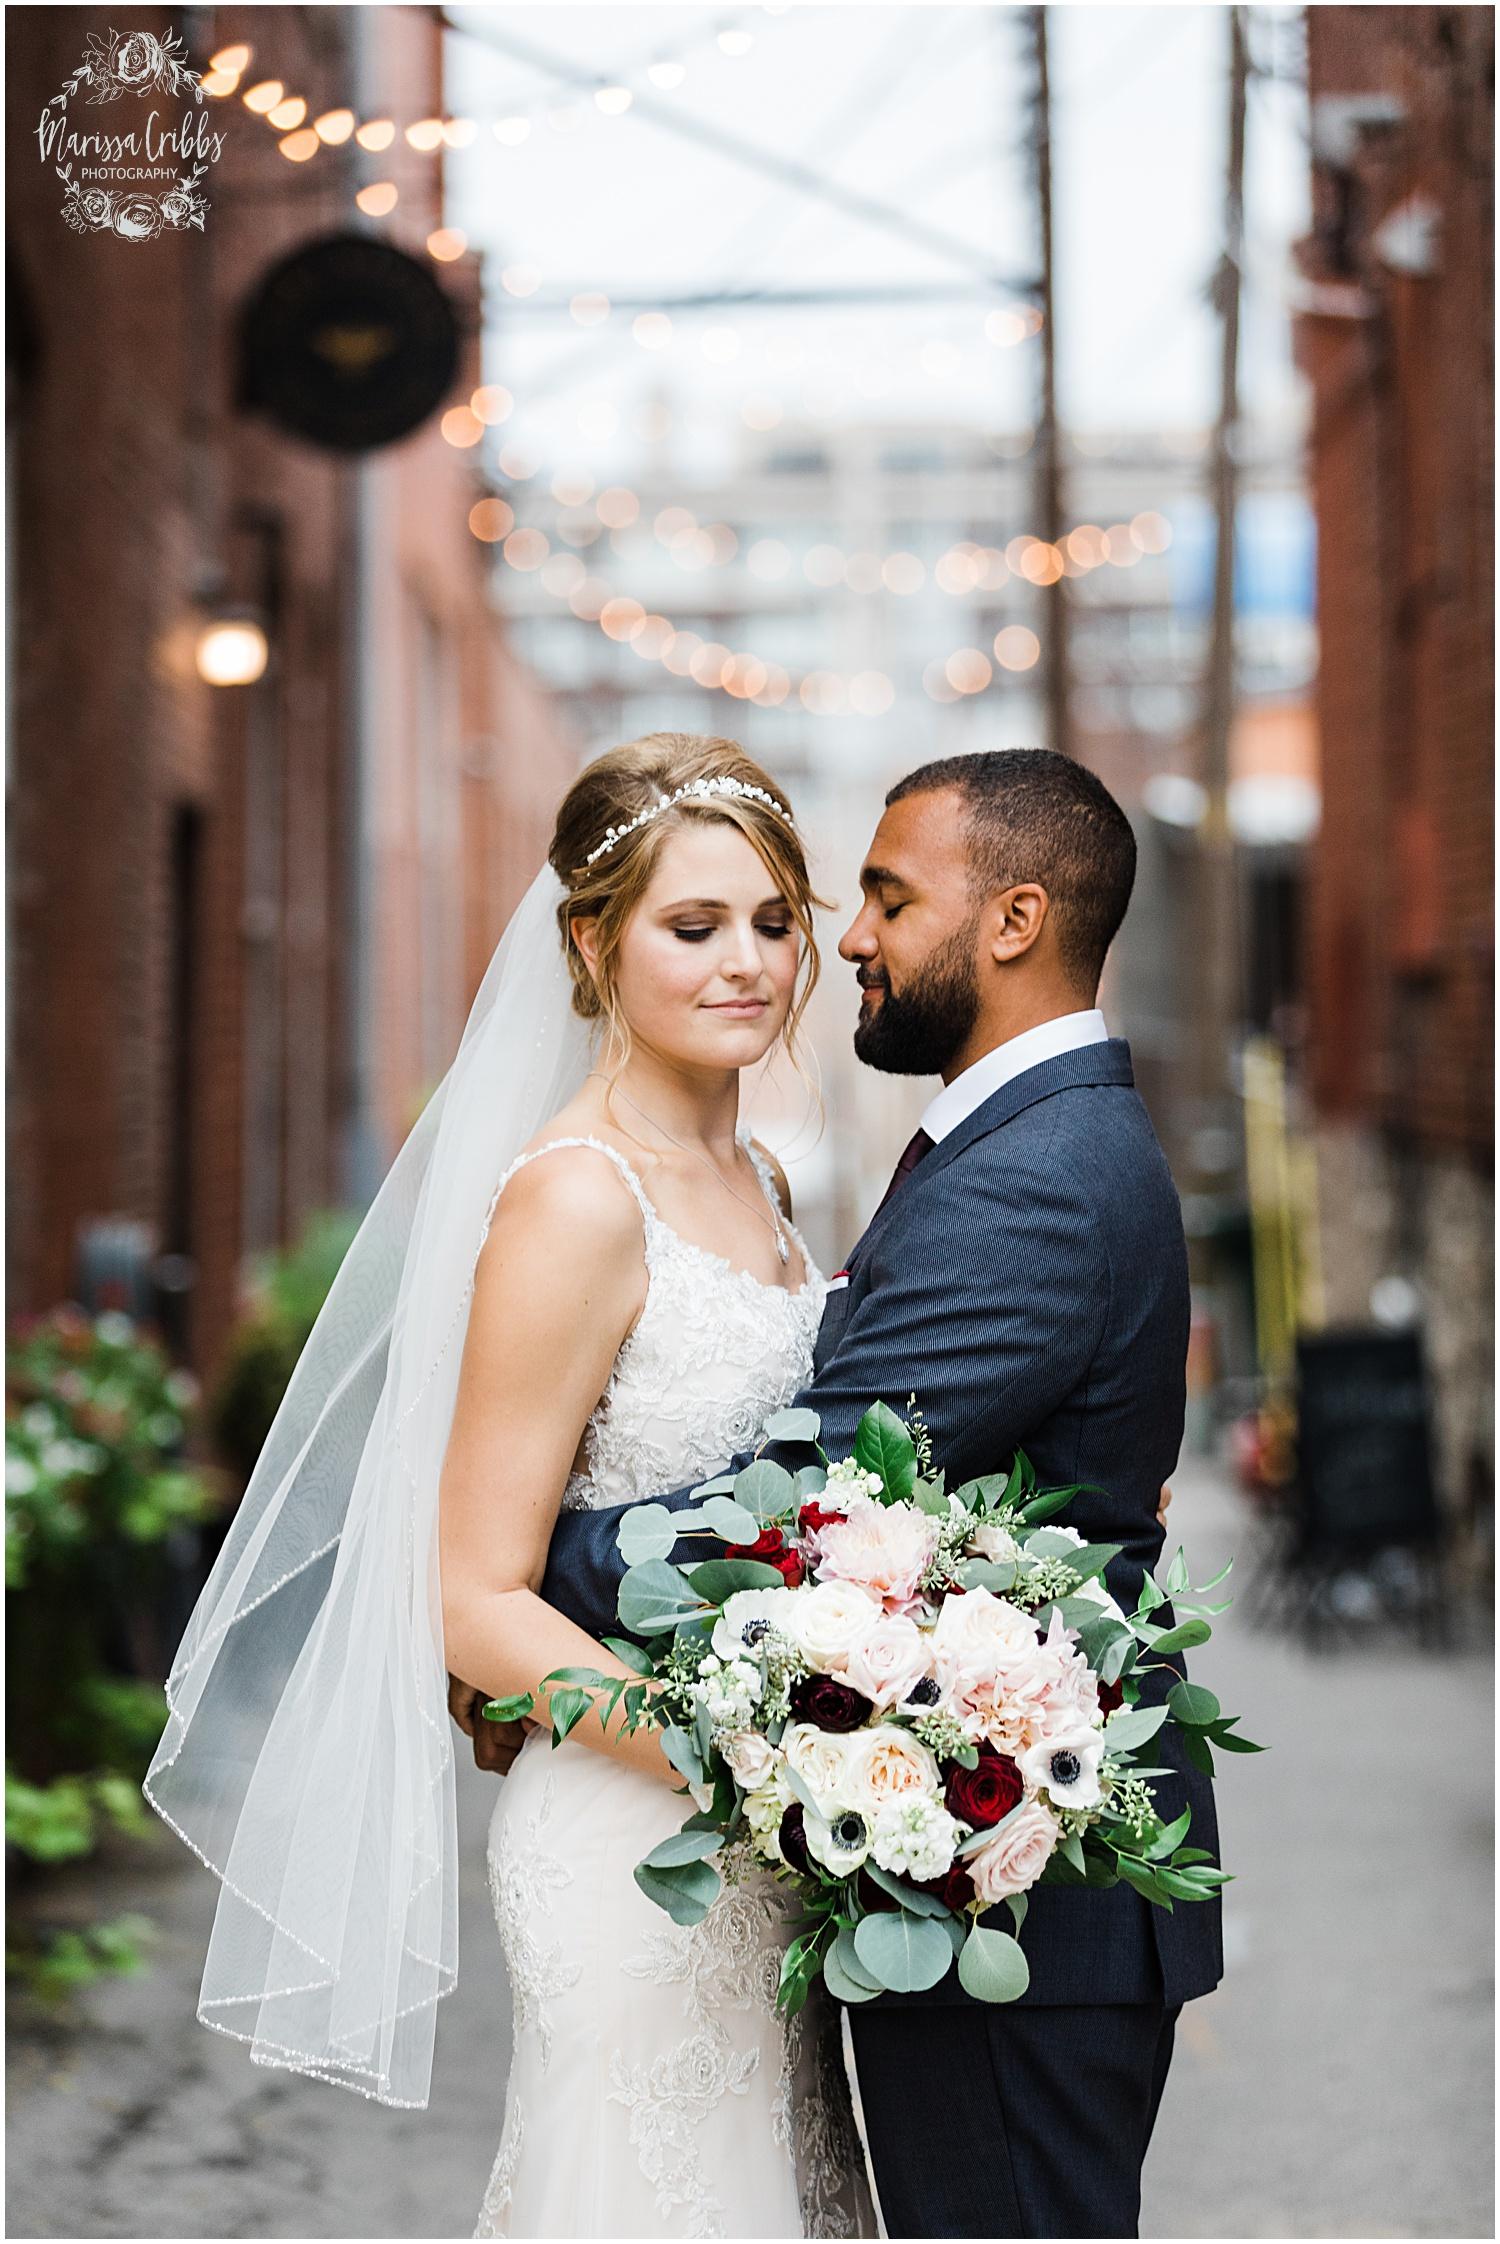 BAUER WEDDING   KELSEA & JUSTIN   MARISSA CRIBBS PHOTOGRAPHY_6566.jpg